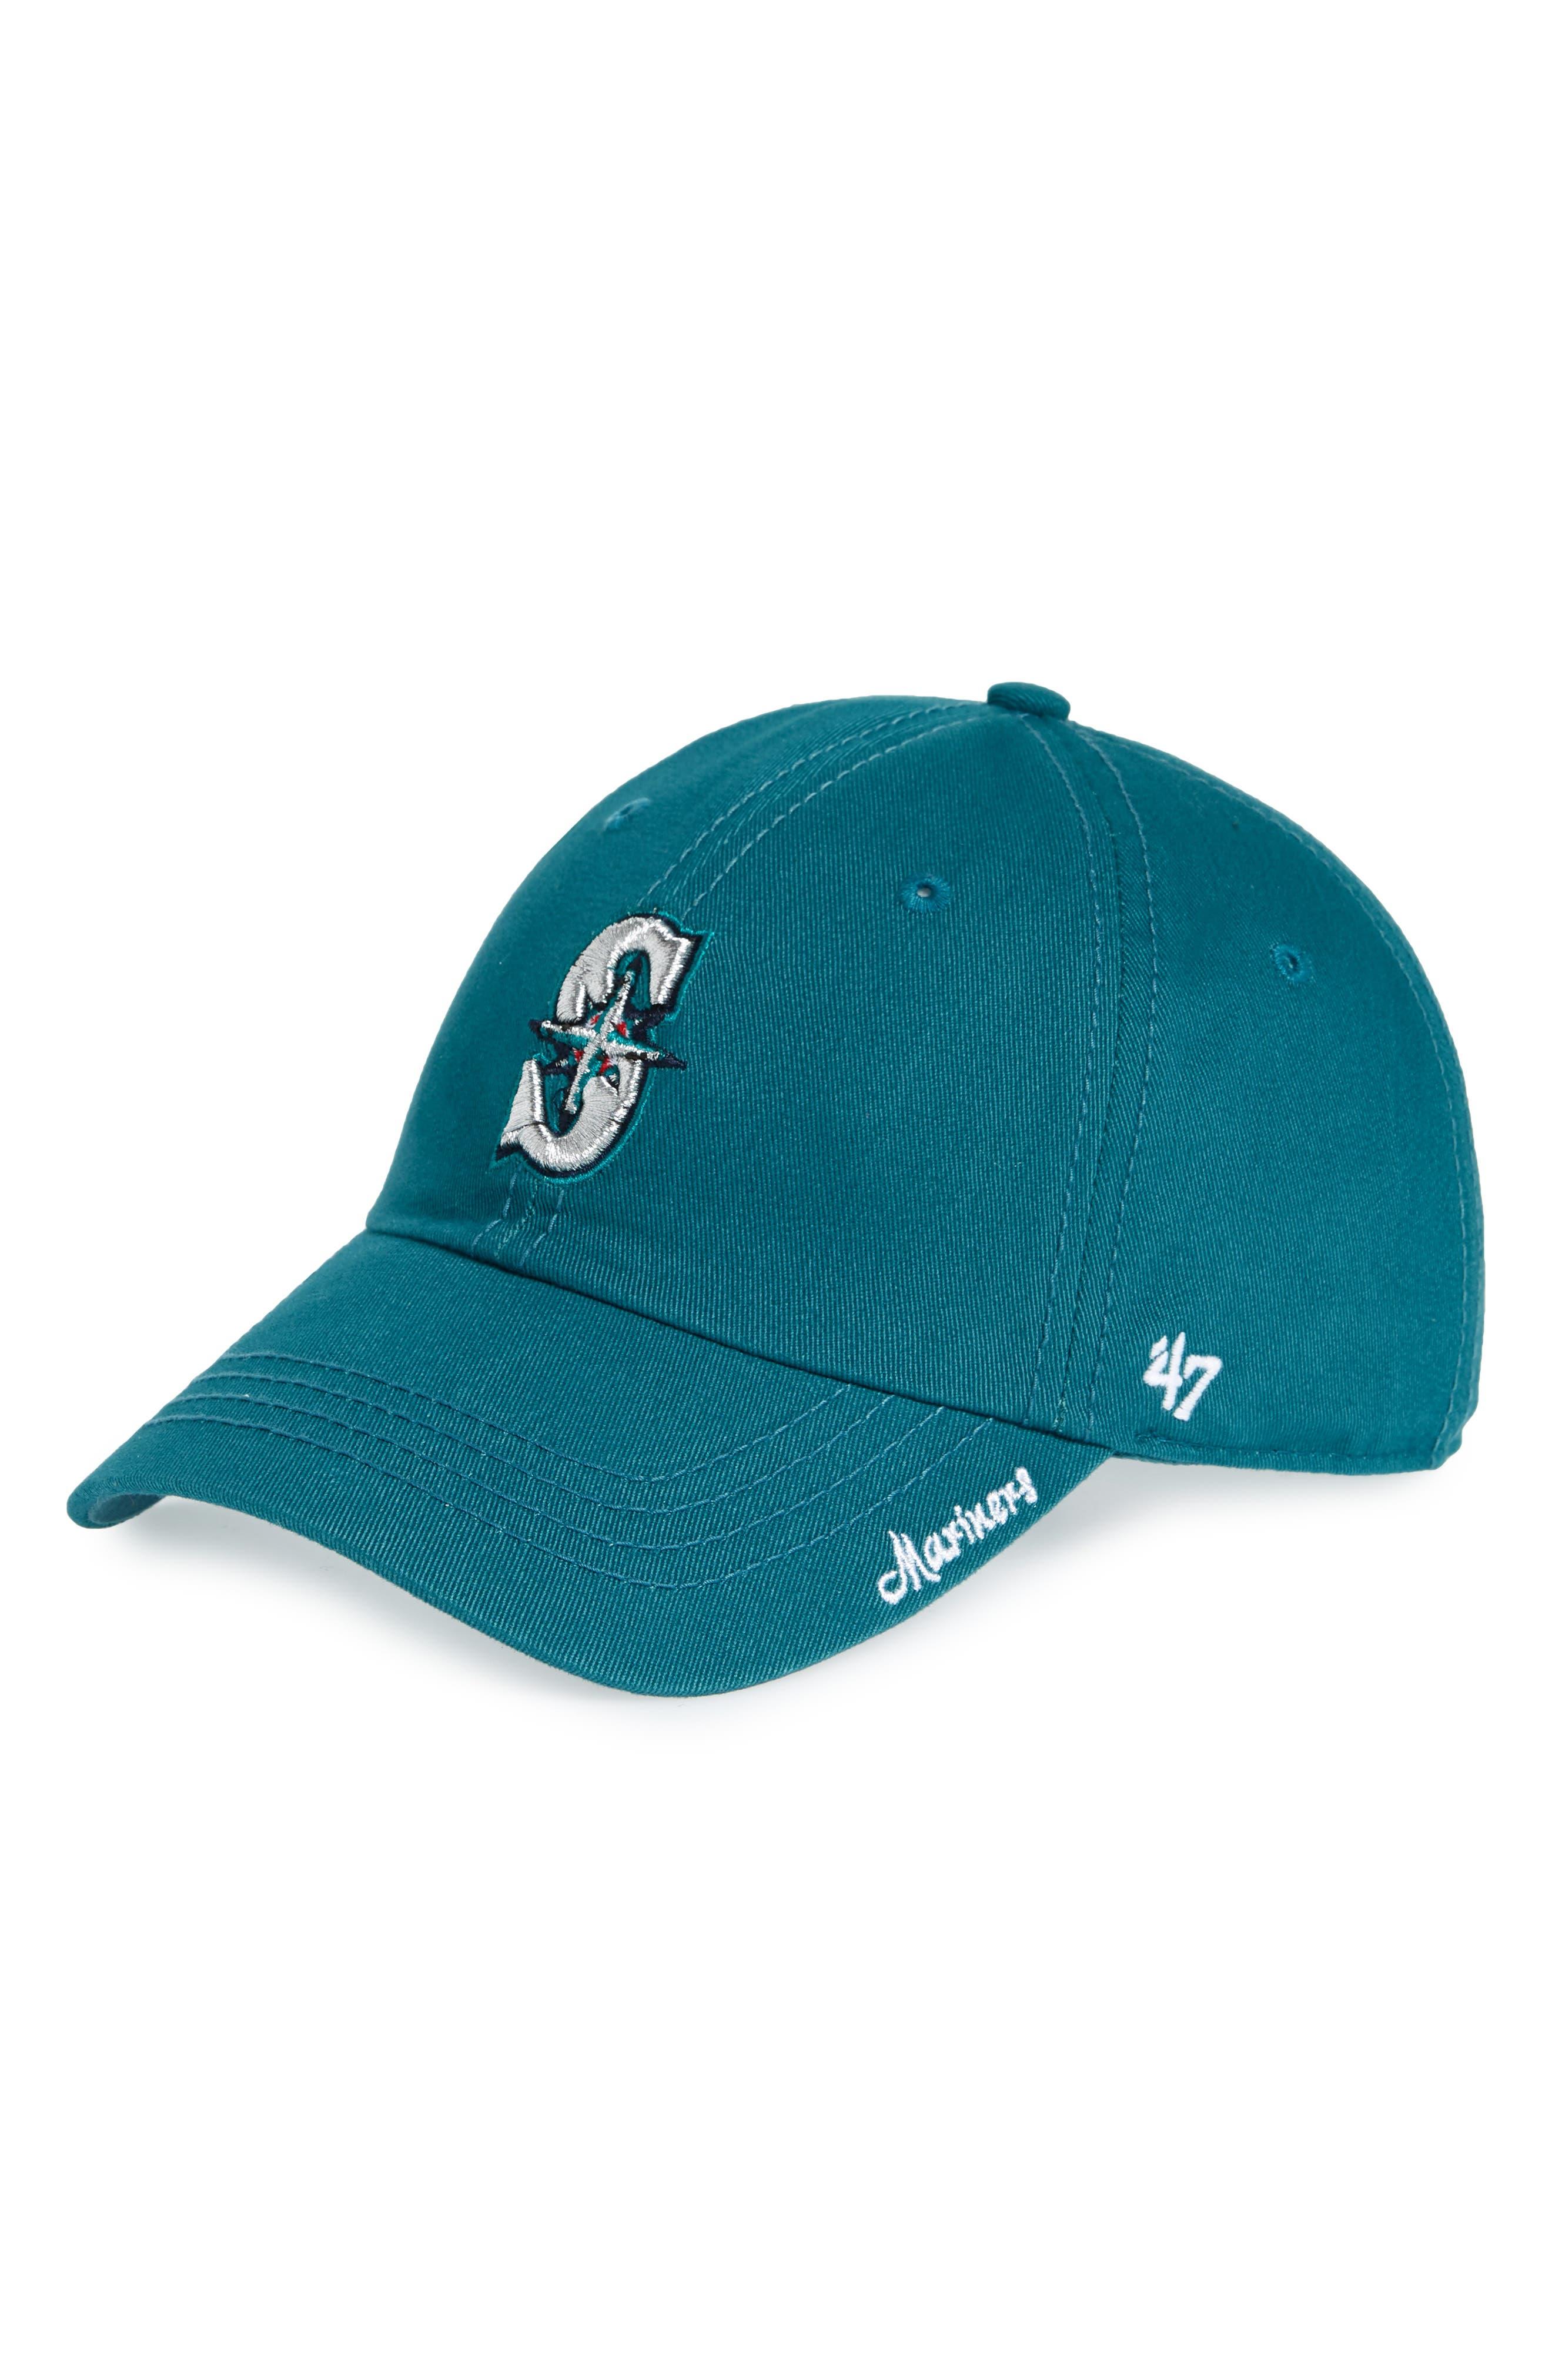 '47 Miata Seattle Mariners Baseball Cap